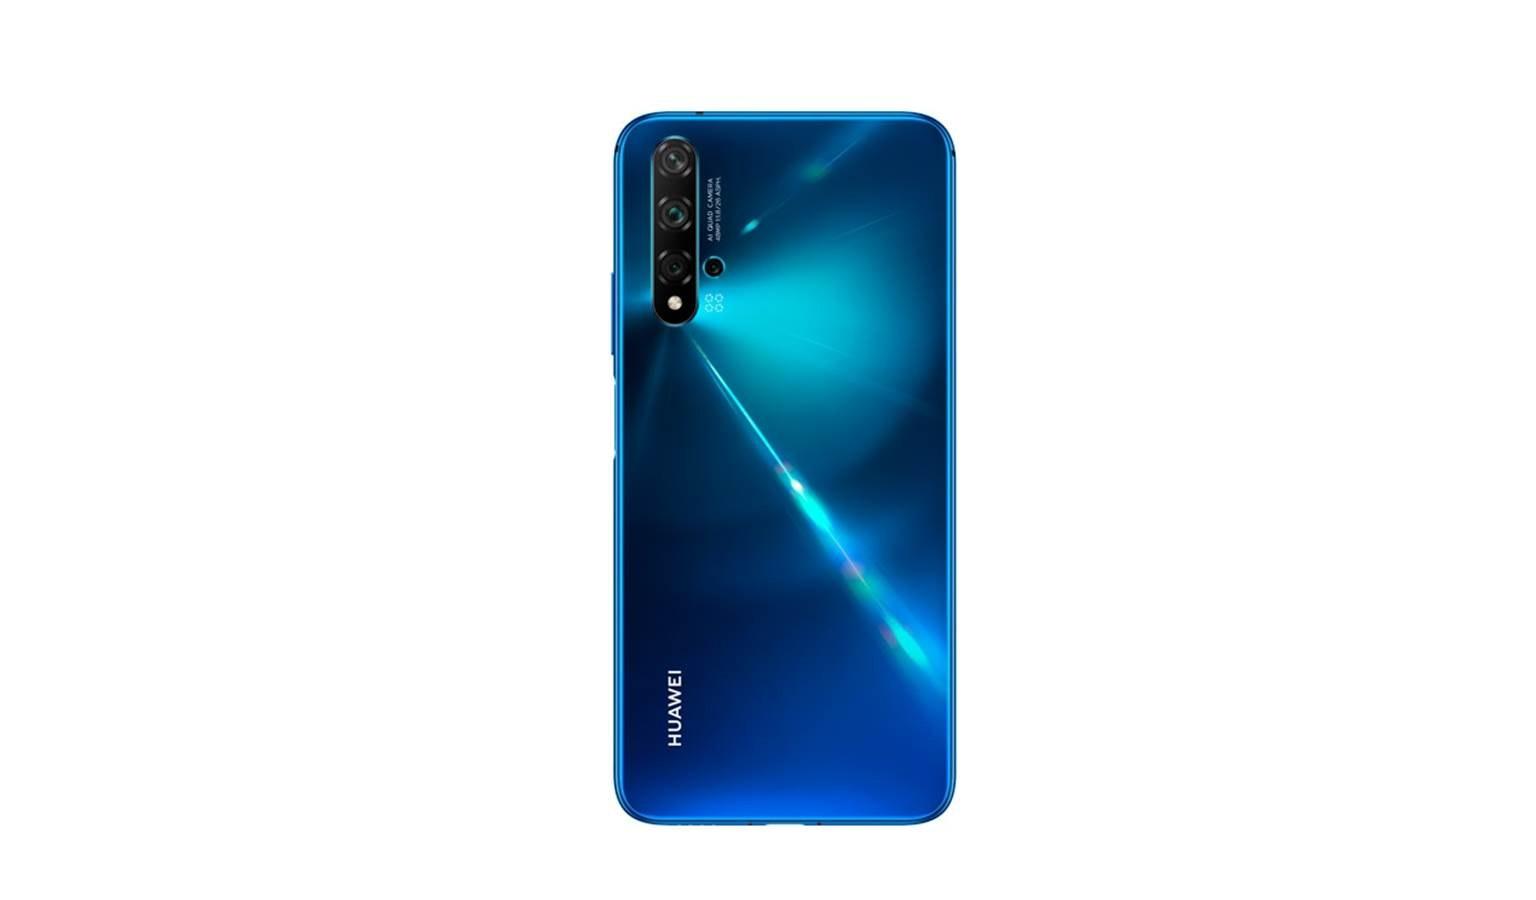 Huawei nova 5t crush blue претензия потребителя о возврате денег